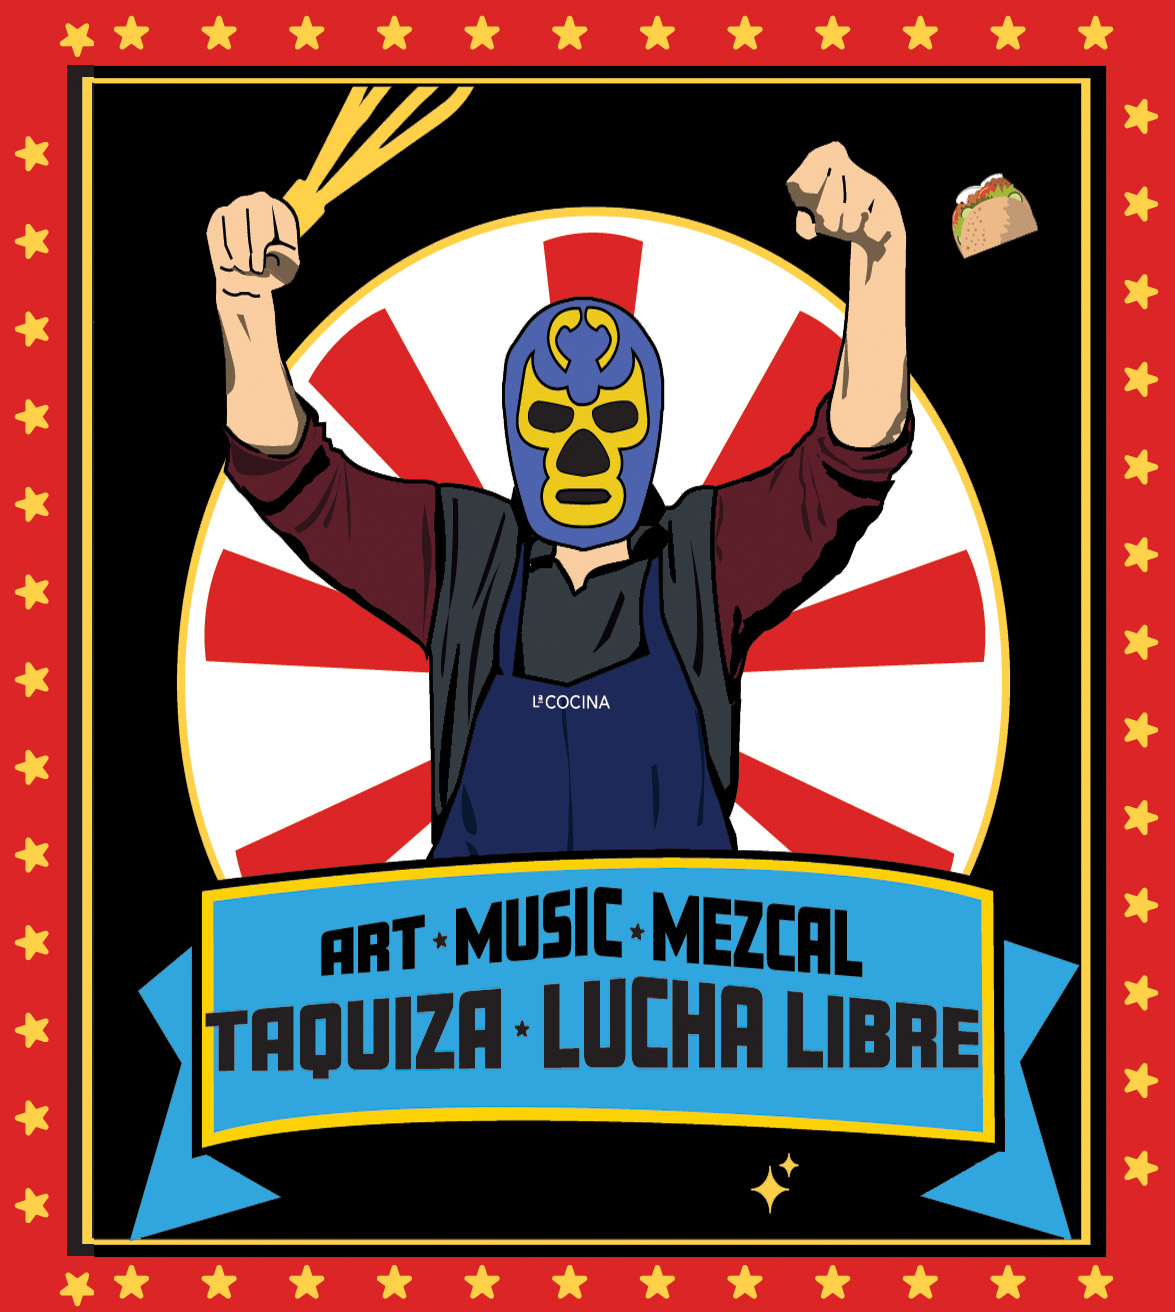 Art, Music, Mezcal, Taquiza, Lucha Libre